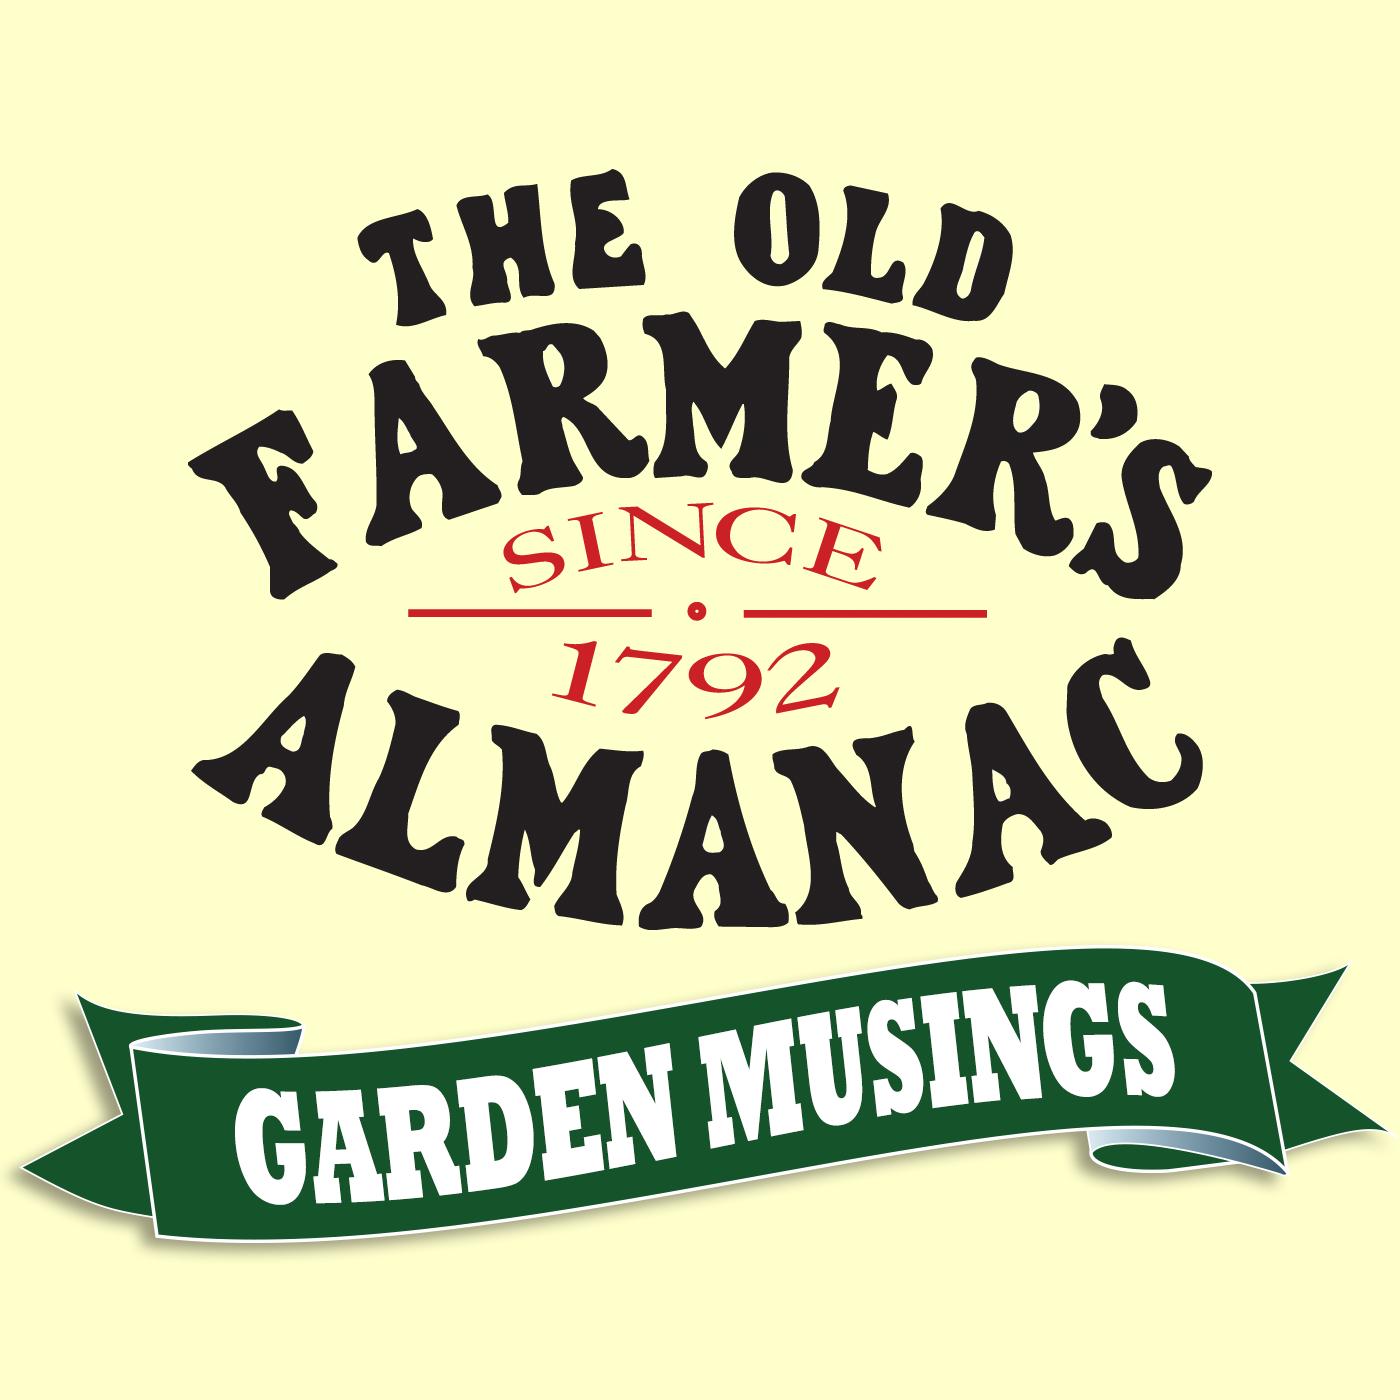 Garden Musings Podcasts